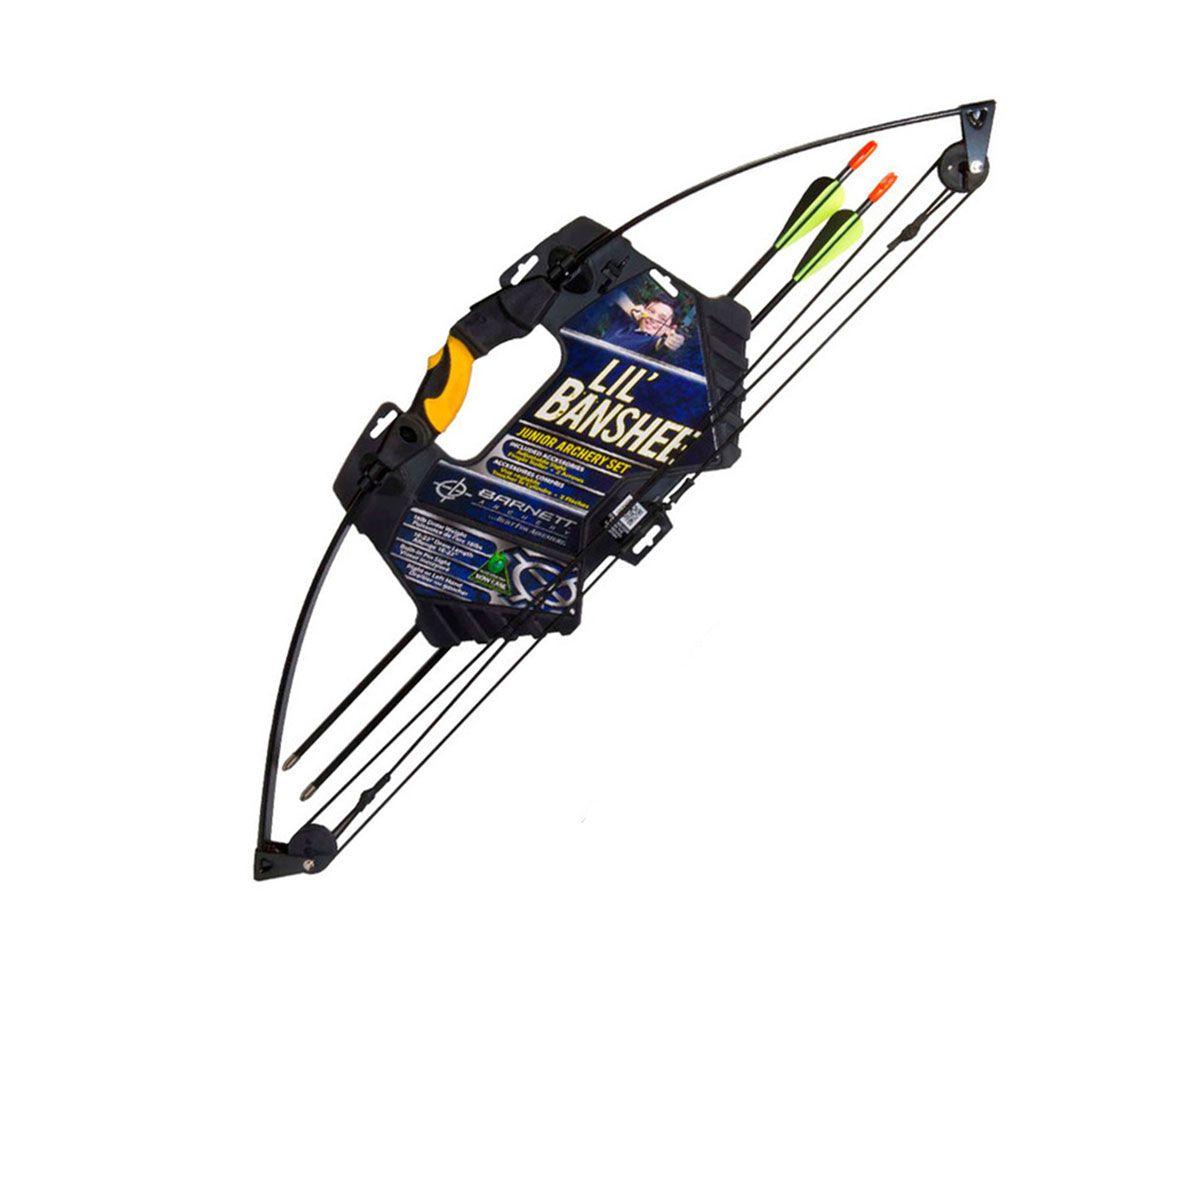 Arco Barnett Commader LilBanshee 18Lb c/ 2 Flechas Inclusas - Ambidestro Preto